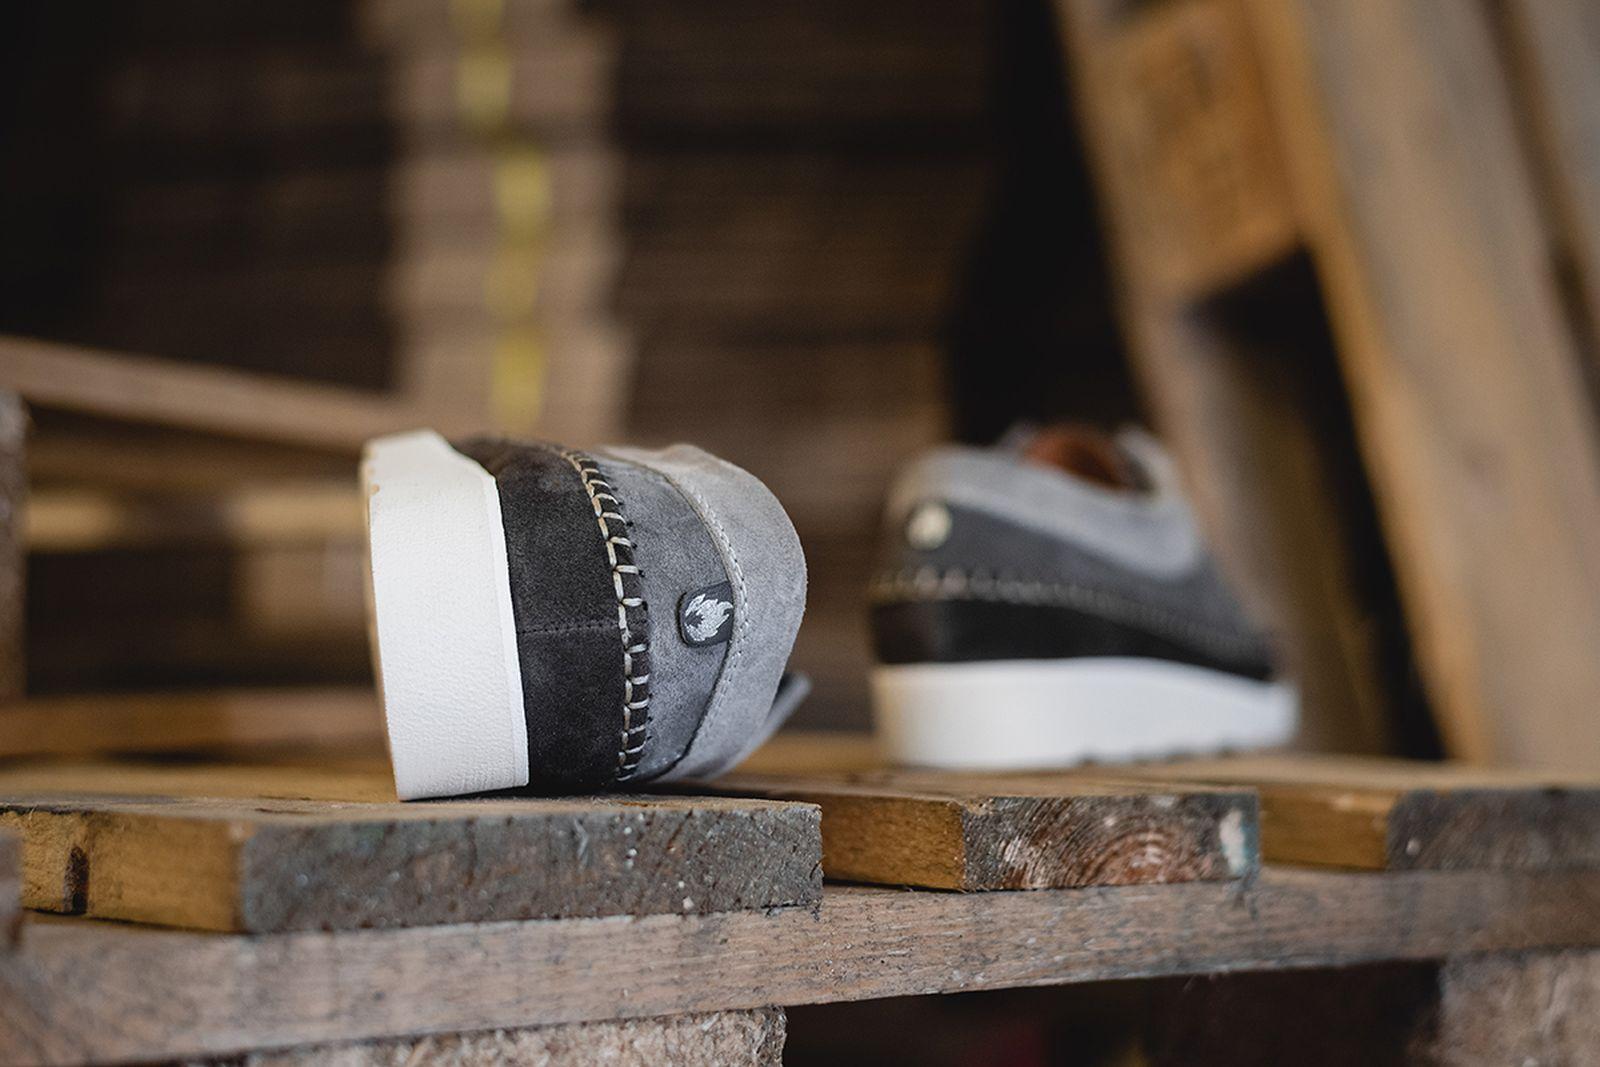 sneaker-news-02-22-2021-04